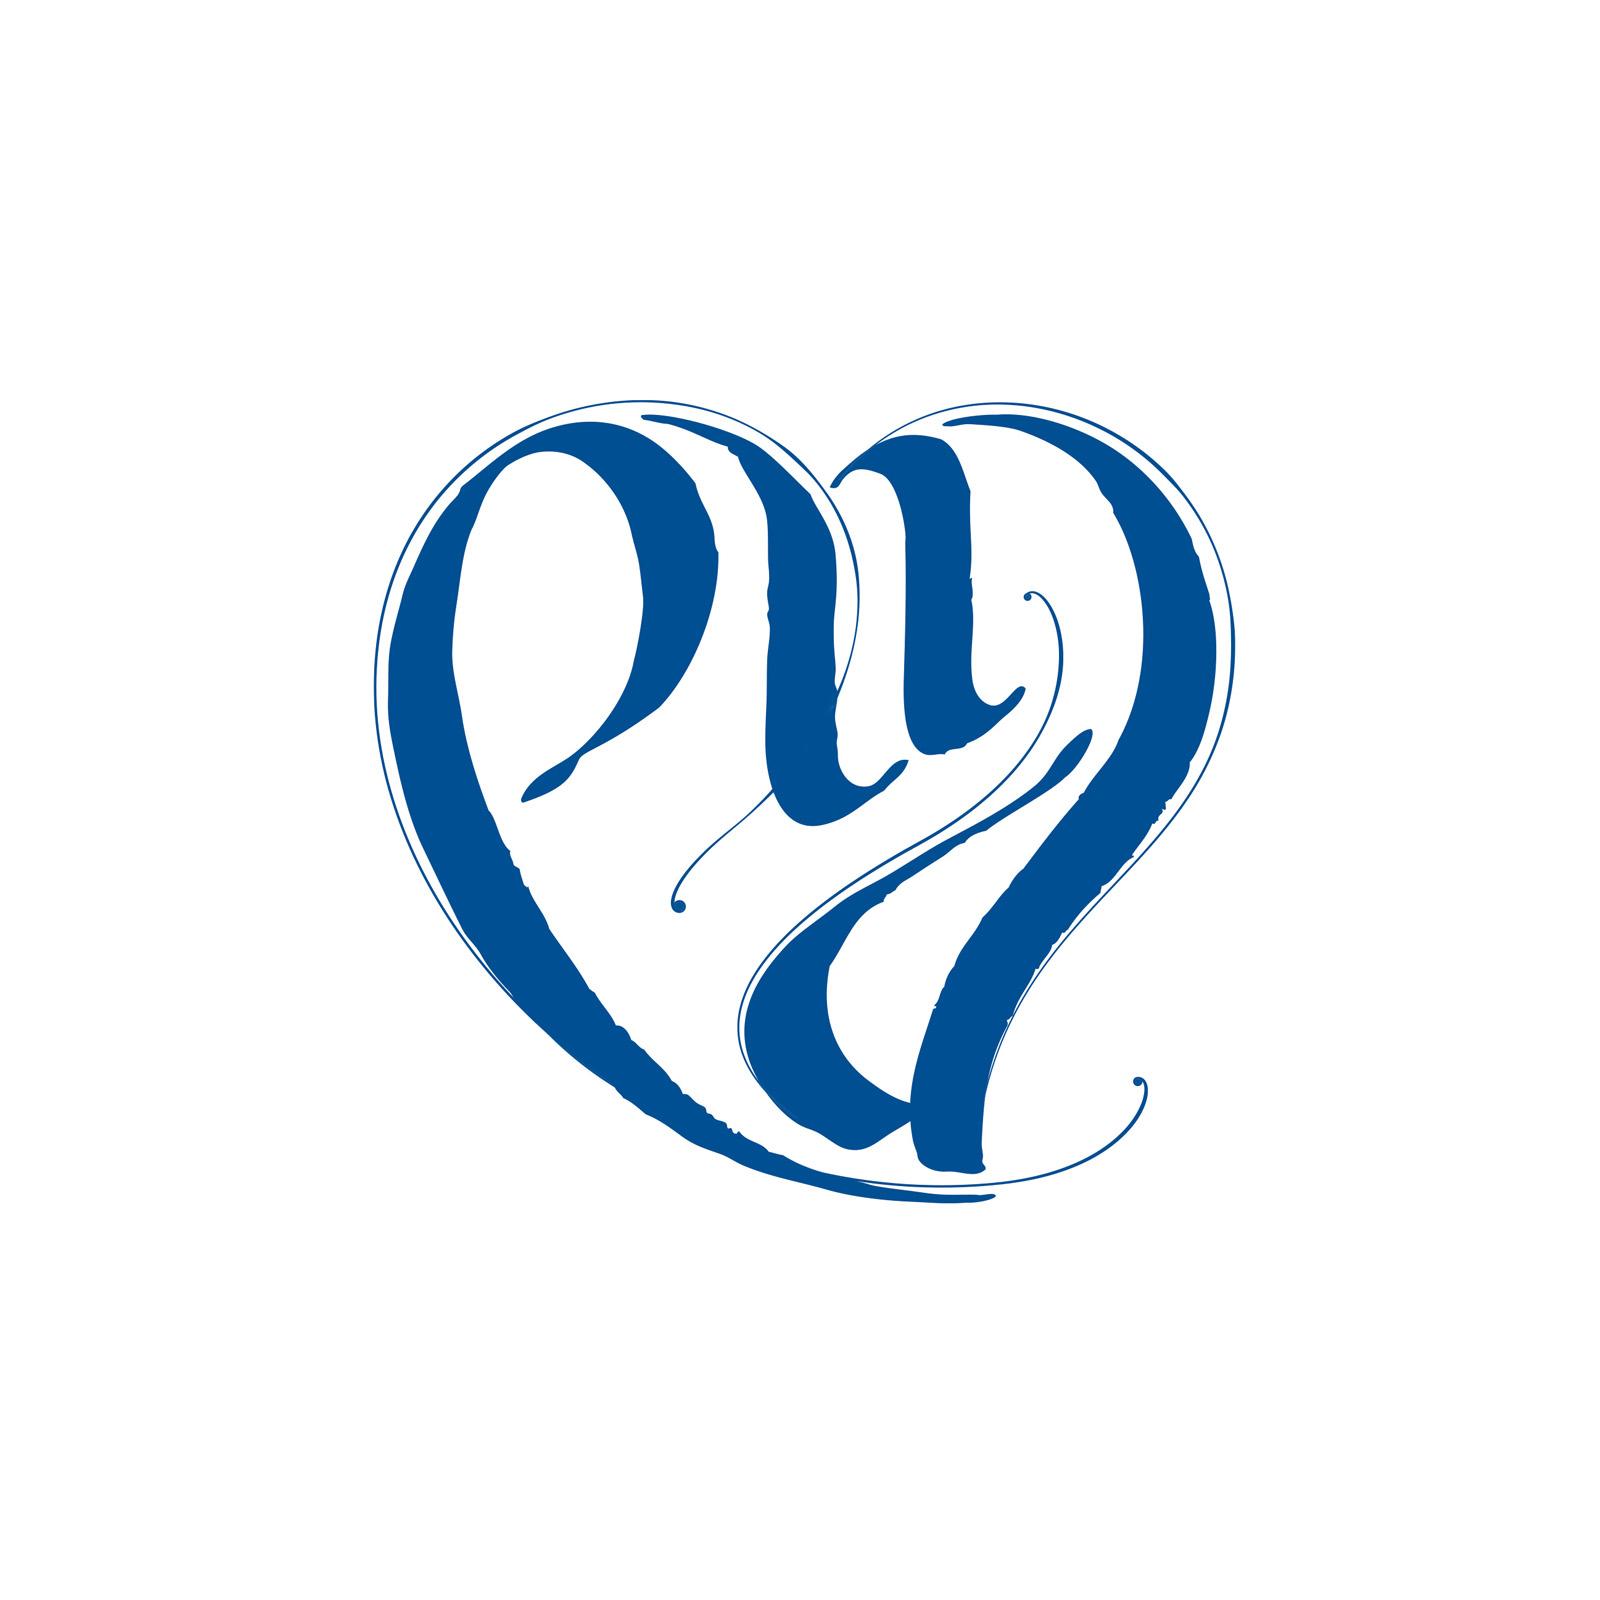 Personal logo for Ella